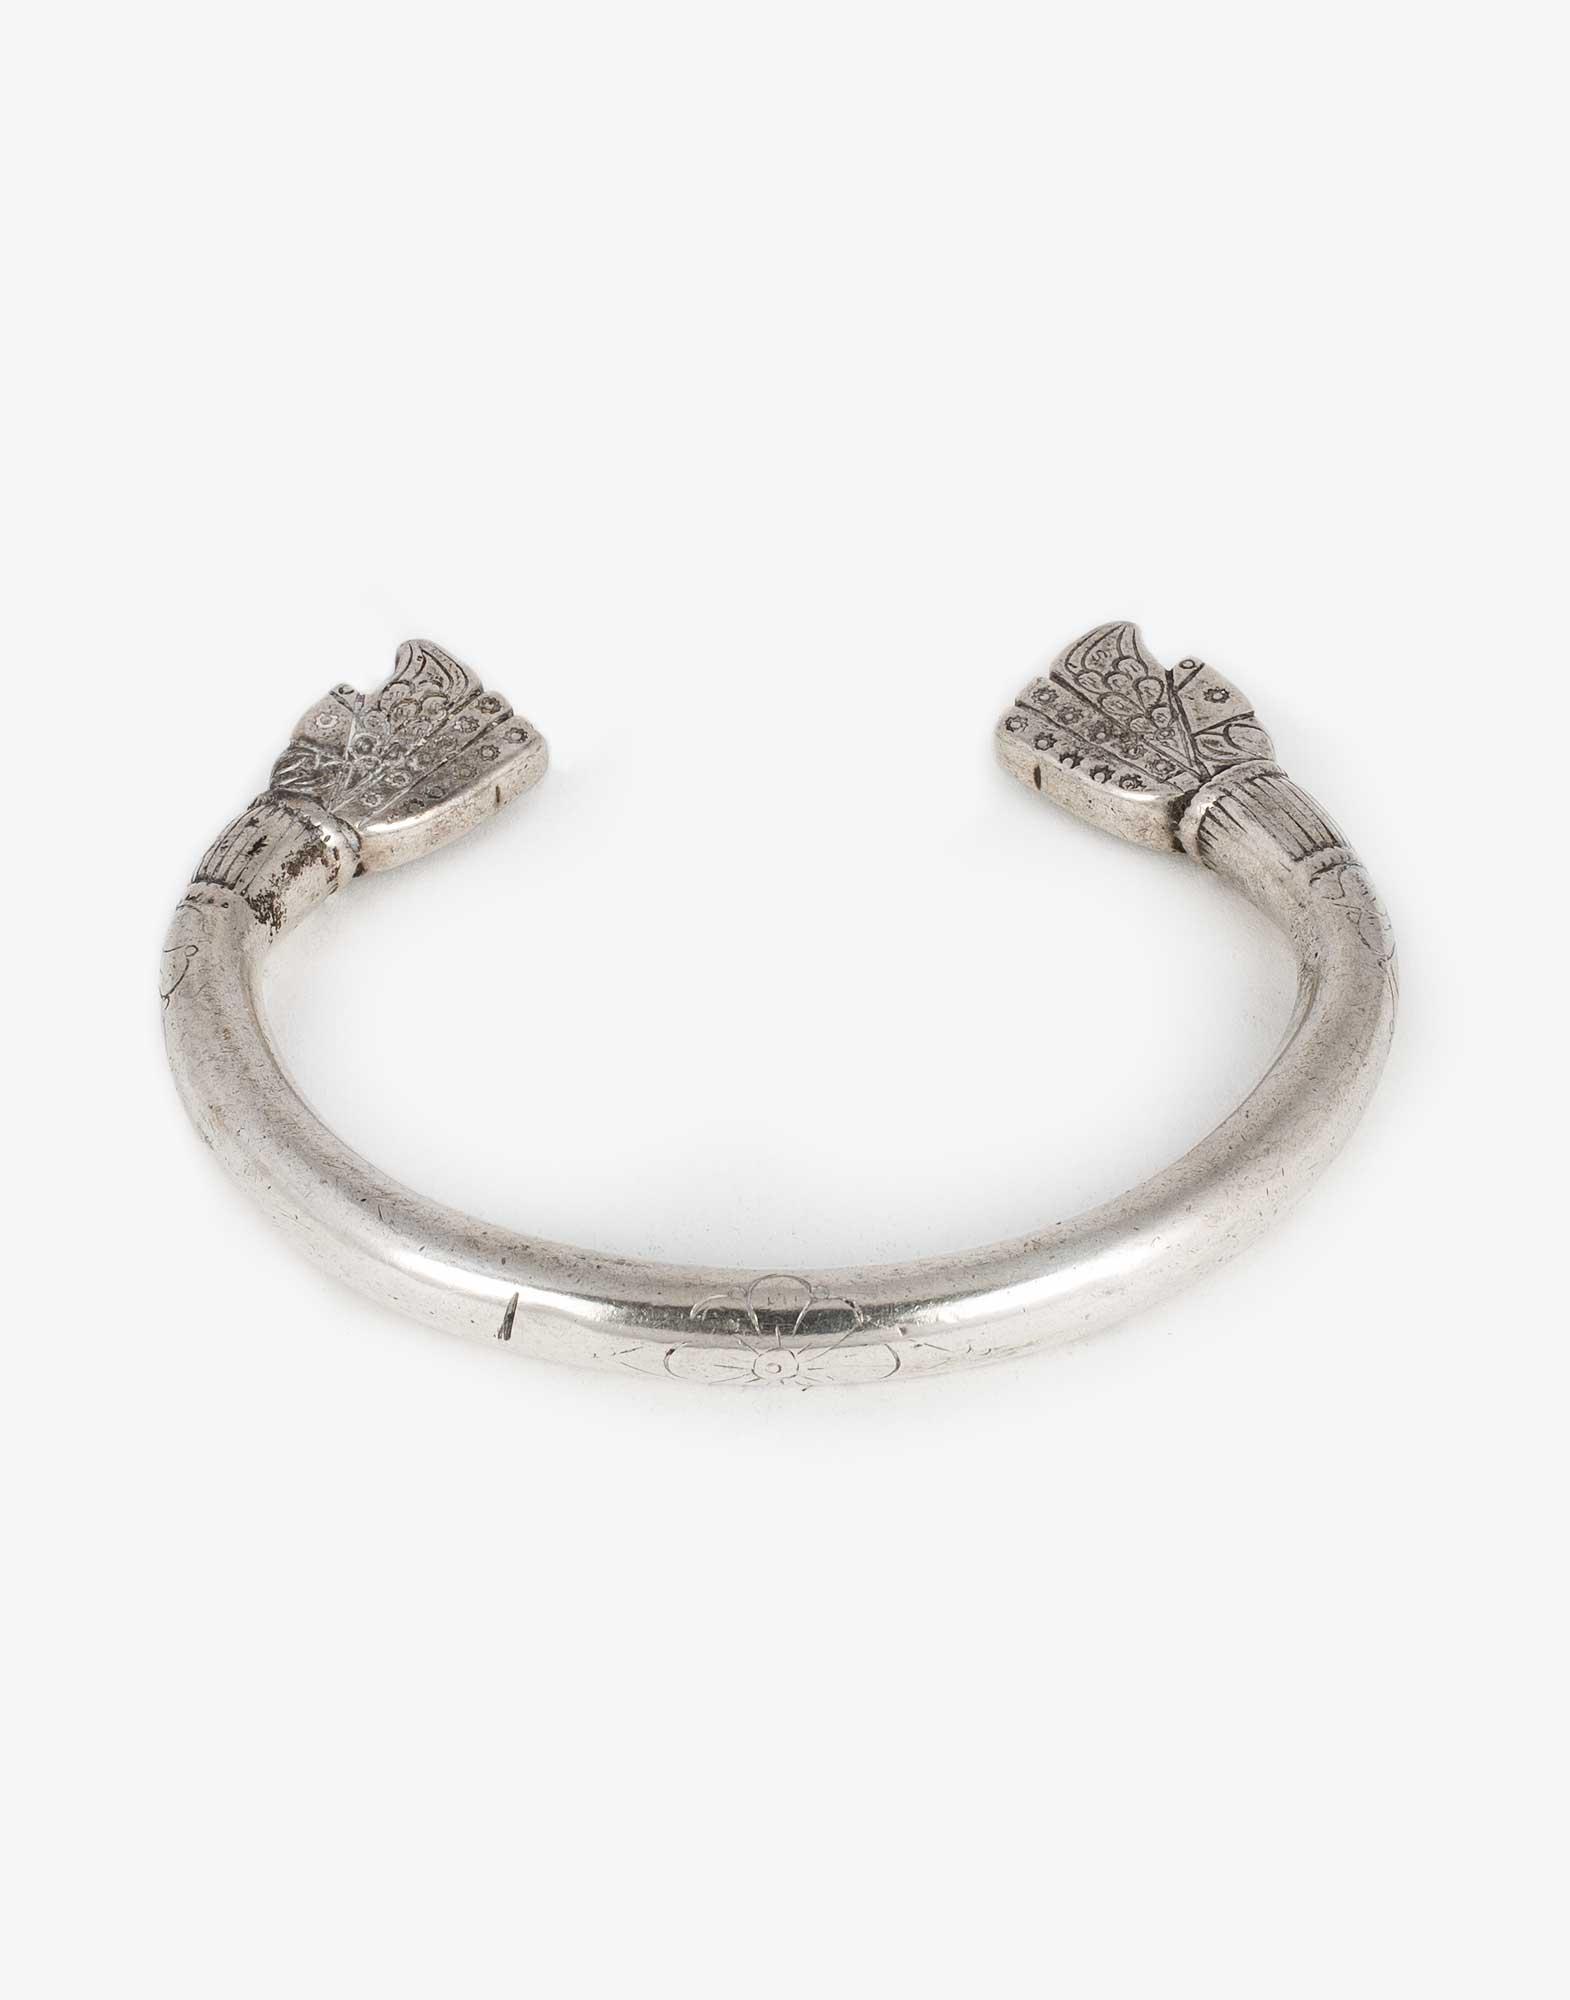 Antique Silver Bracelet Bangle